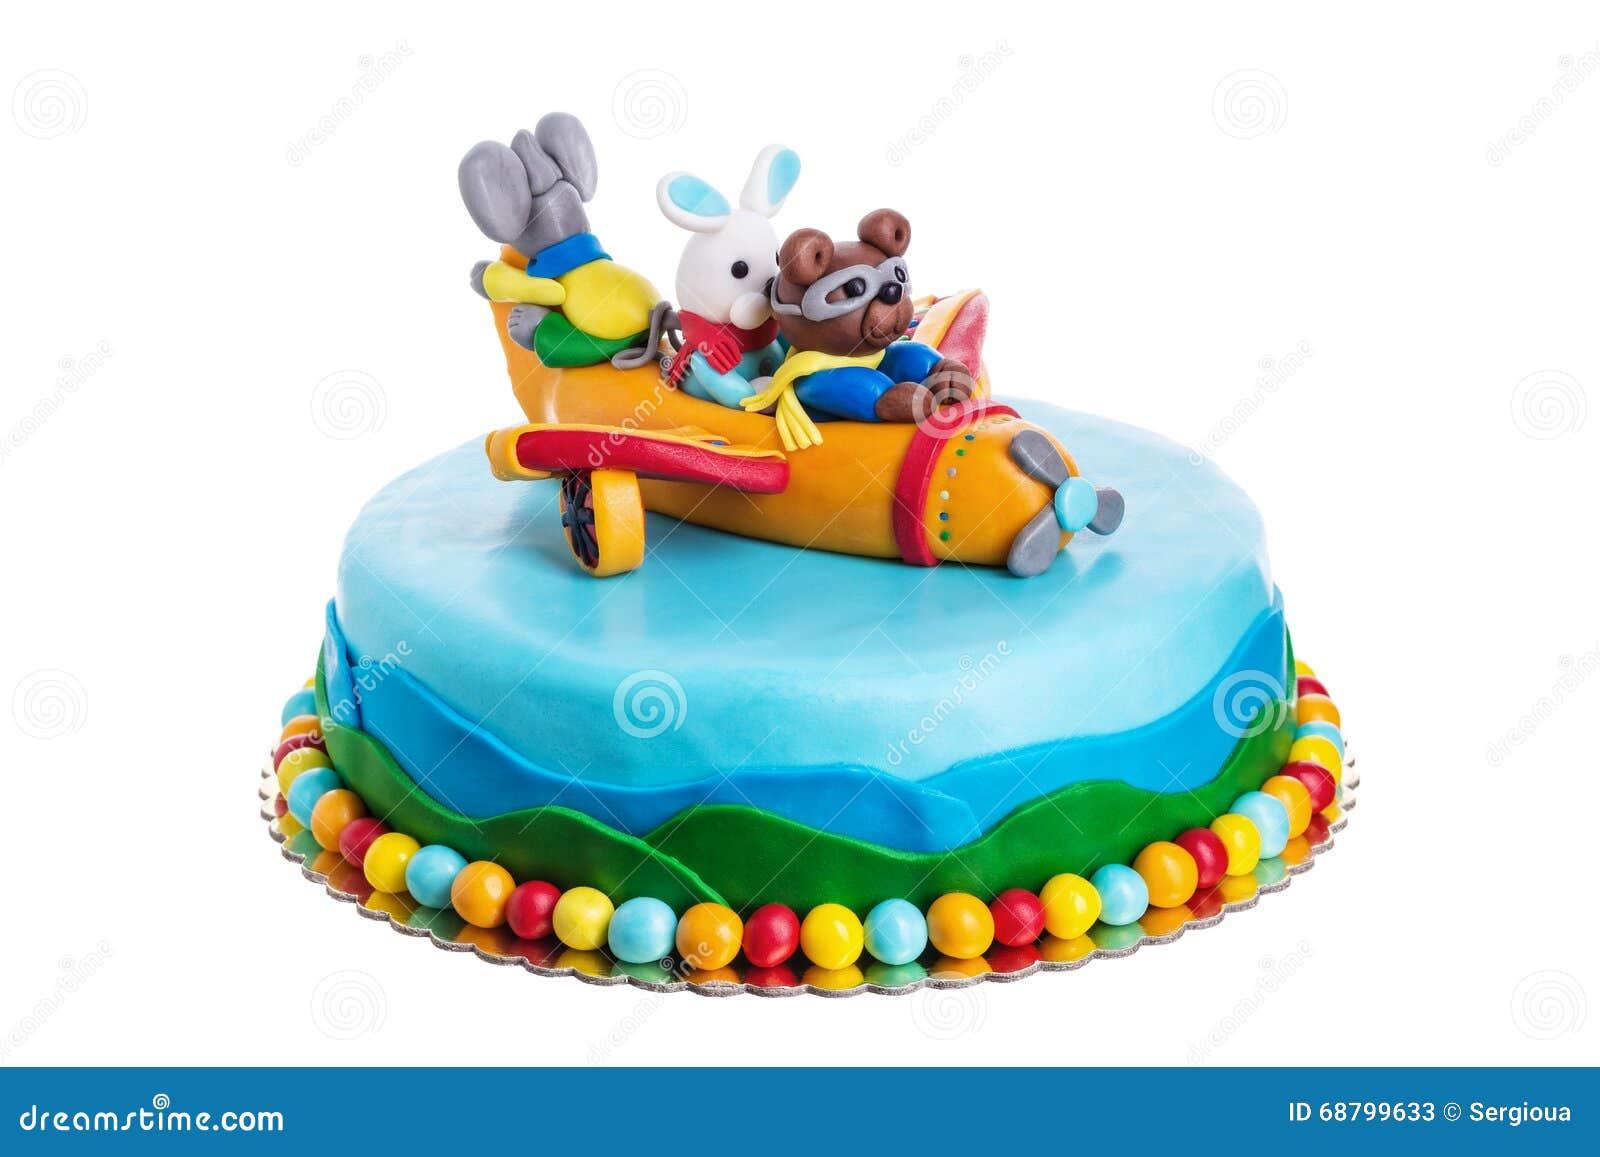 Fabulous Creative Cake Animals Birthday Of Children Stock Image Image Funny Birthday Cards Online Benoljebrpdamsfinfo